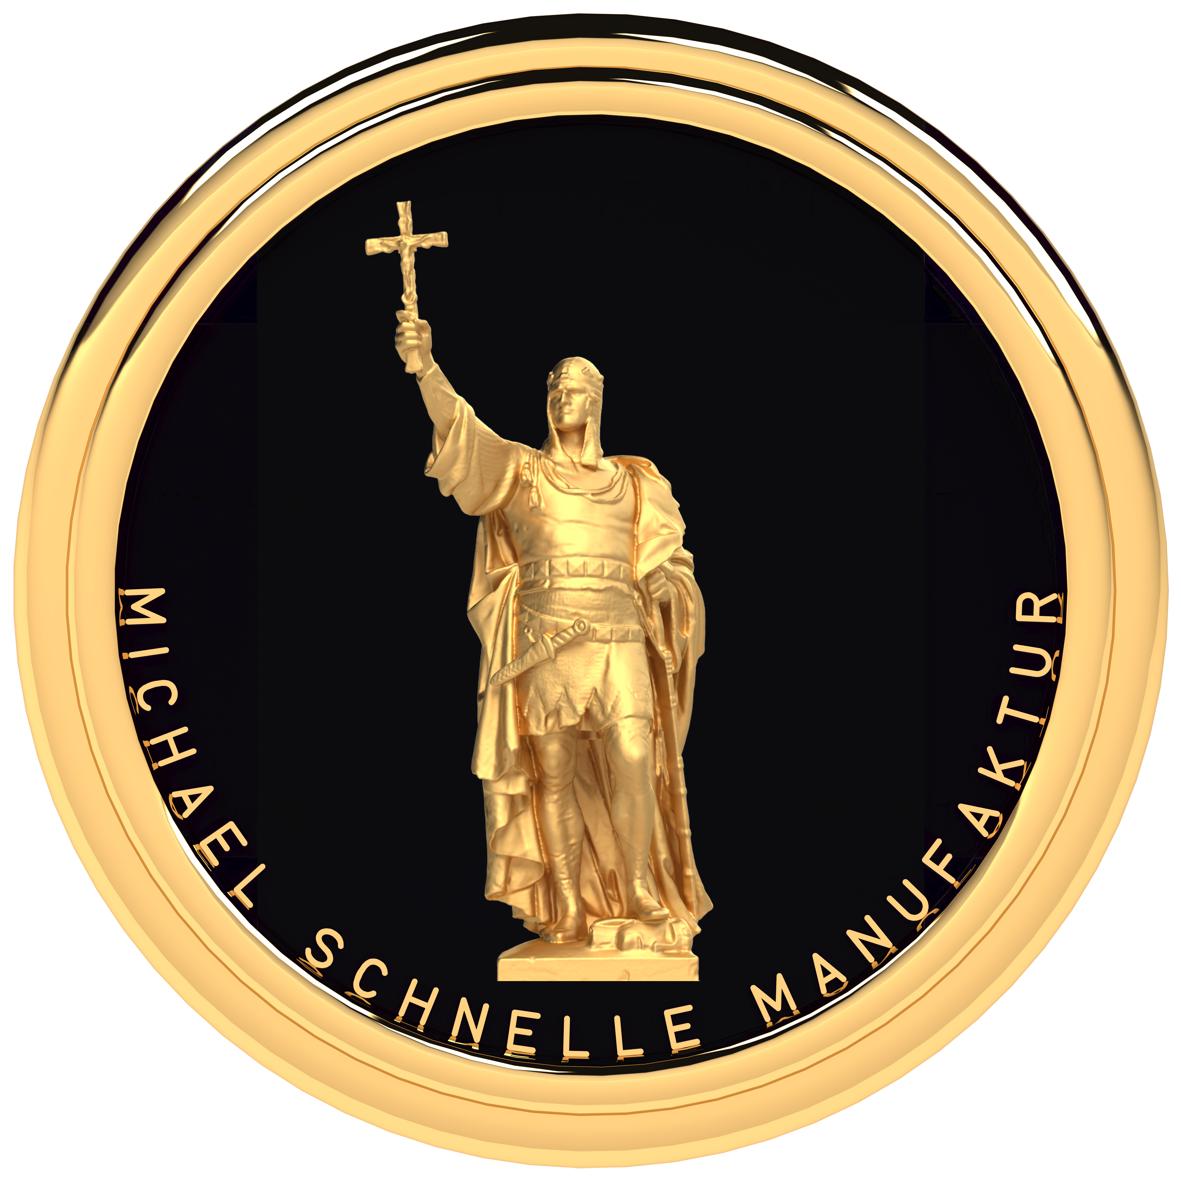 MICHAEL SCHNELLE MANUFAKTUR